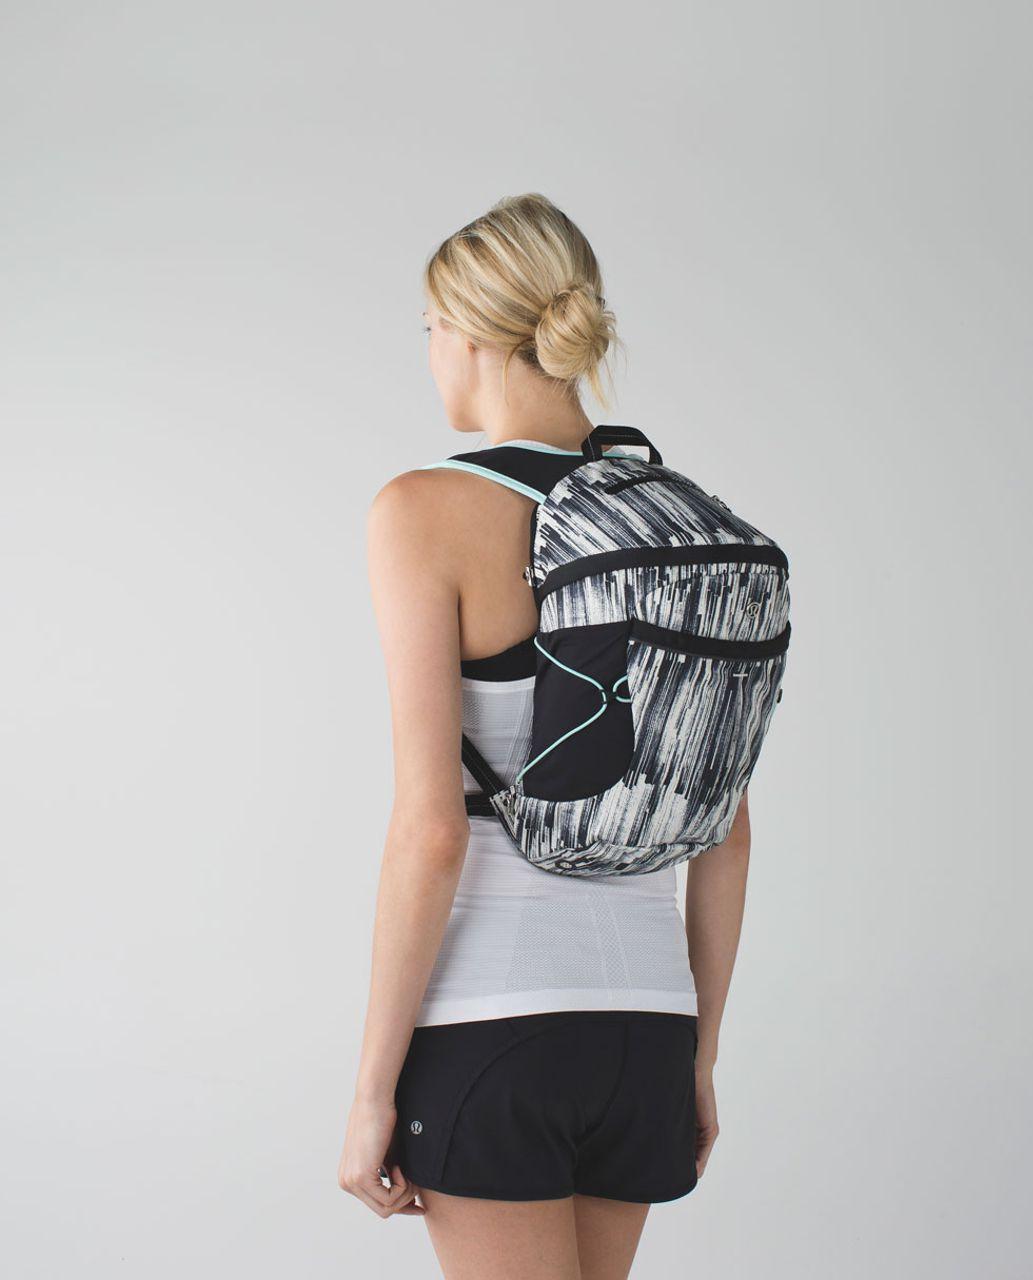 Lululemon Run All Day Backpack - Scratch Match Angel Wing Black / Black